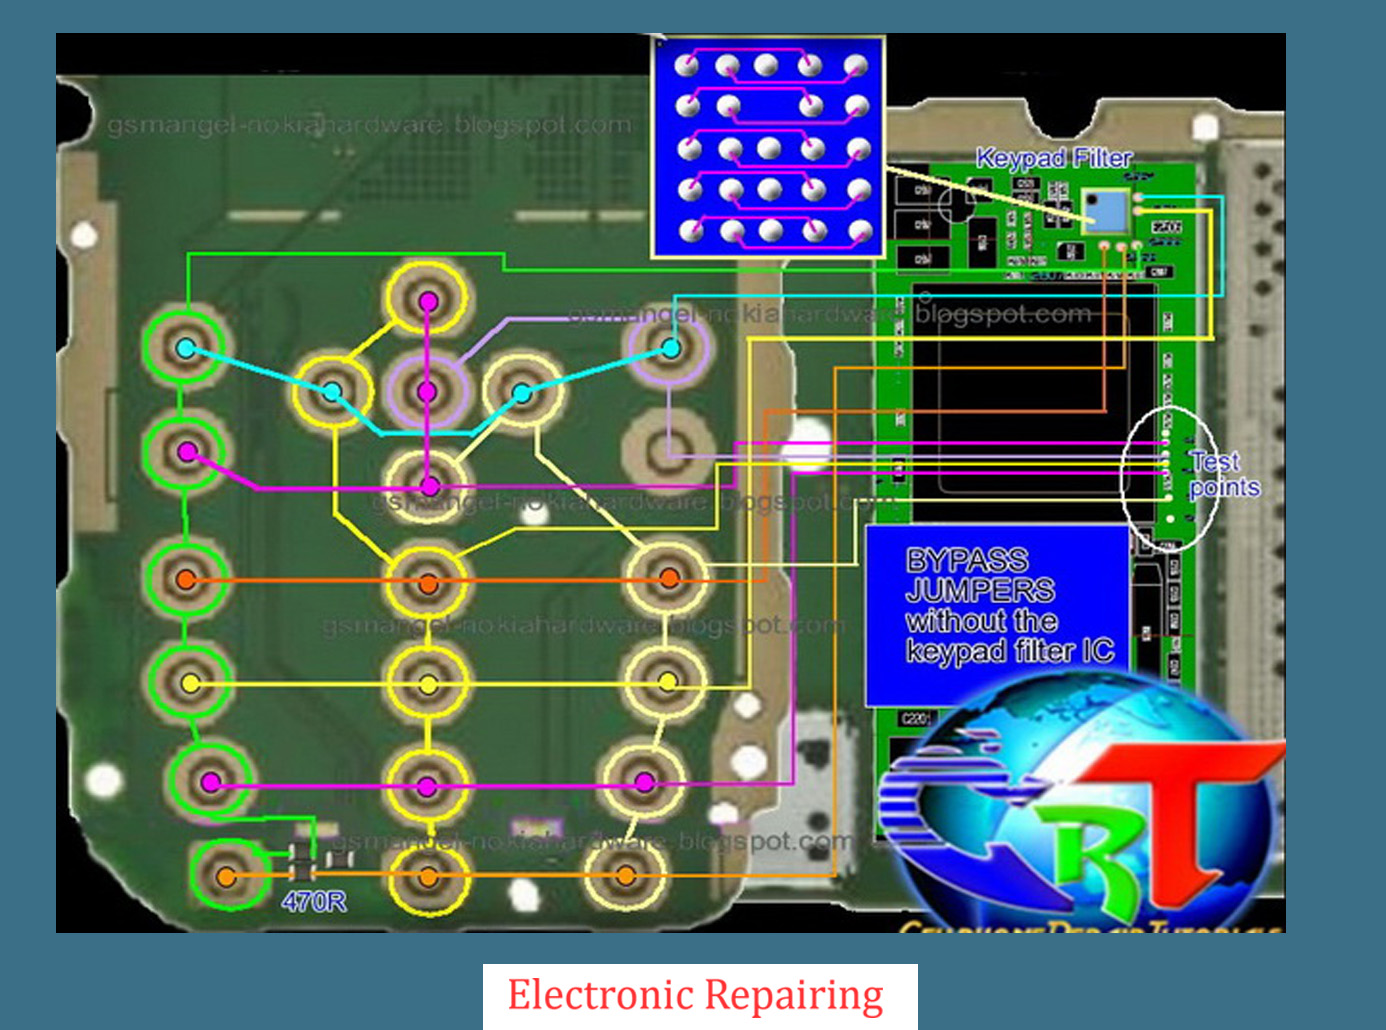 Mobile Repairing Solutions Nokia 6125 Keypad Ic Jumper – Fondos de